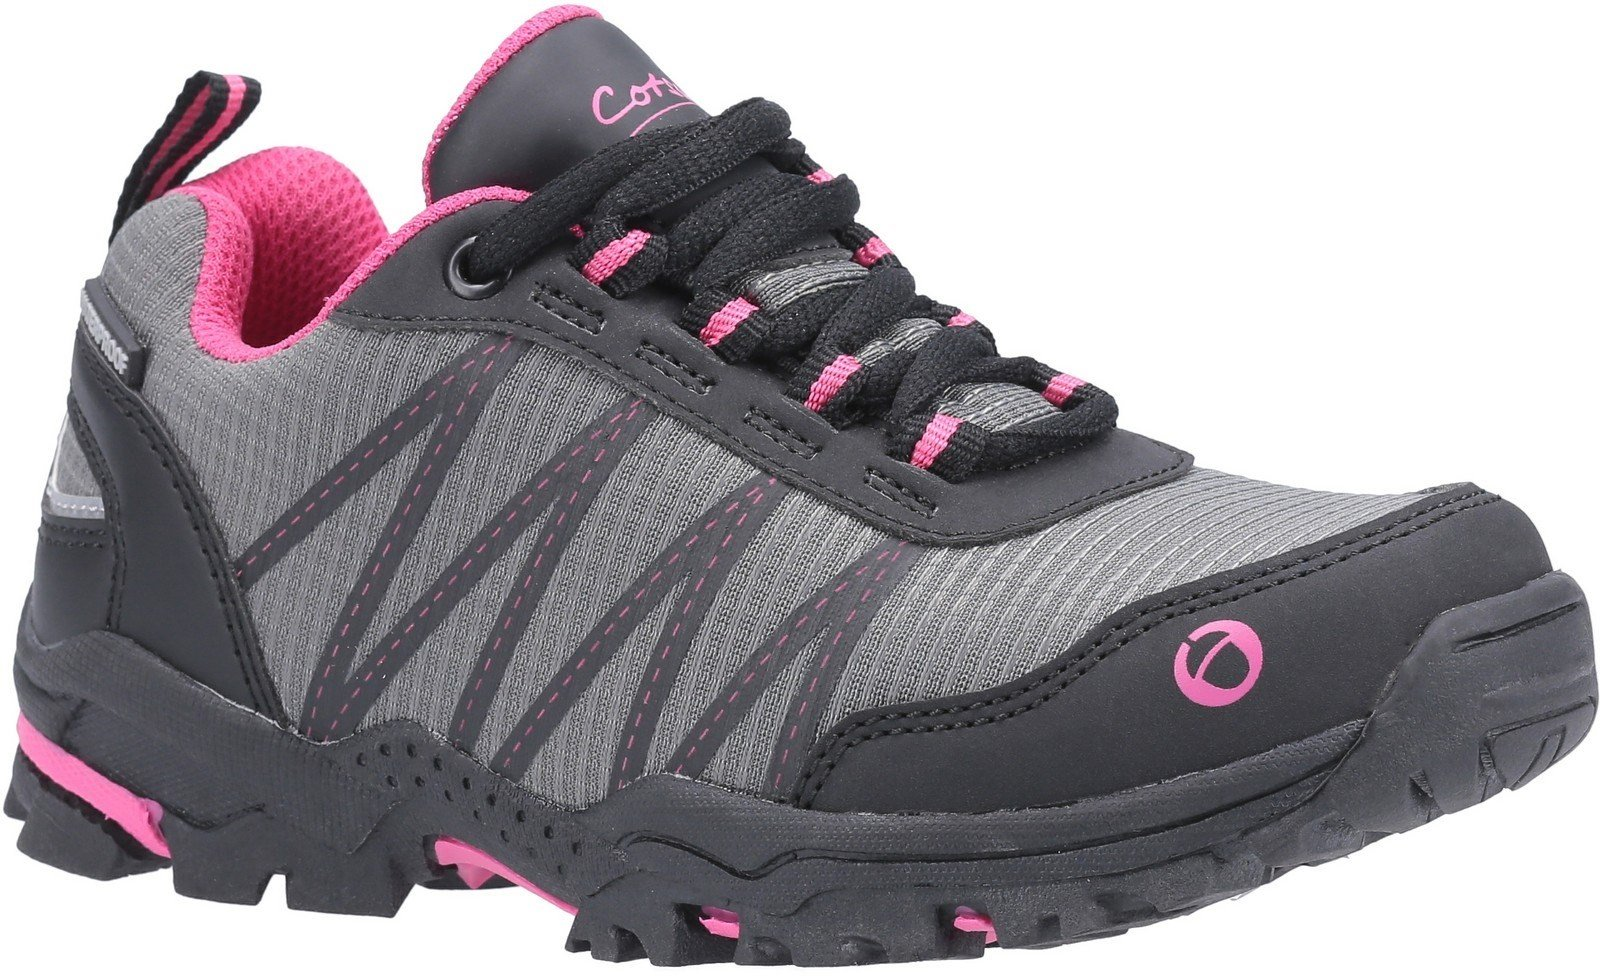 Cotswold Kids Littledean Lace Up Hiking Waterproof Boot Multicolor 30174 - Pink/Grey 10